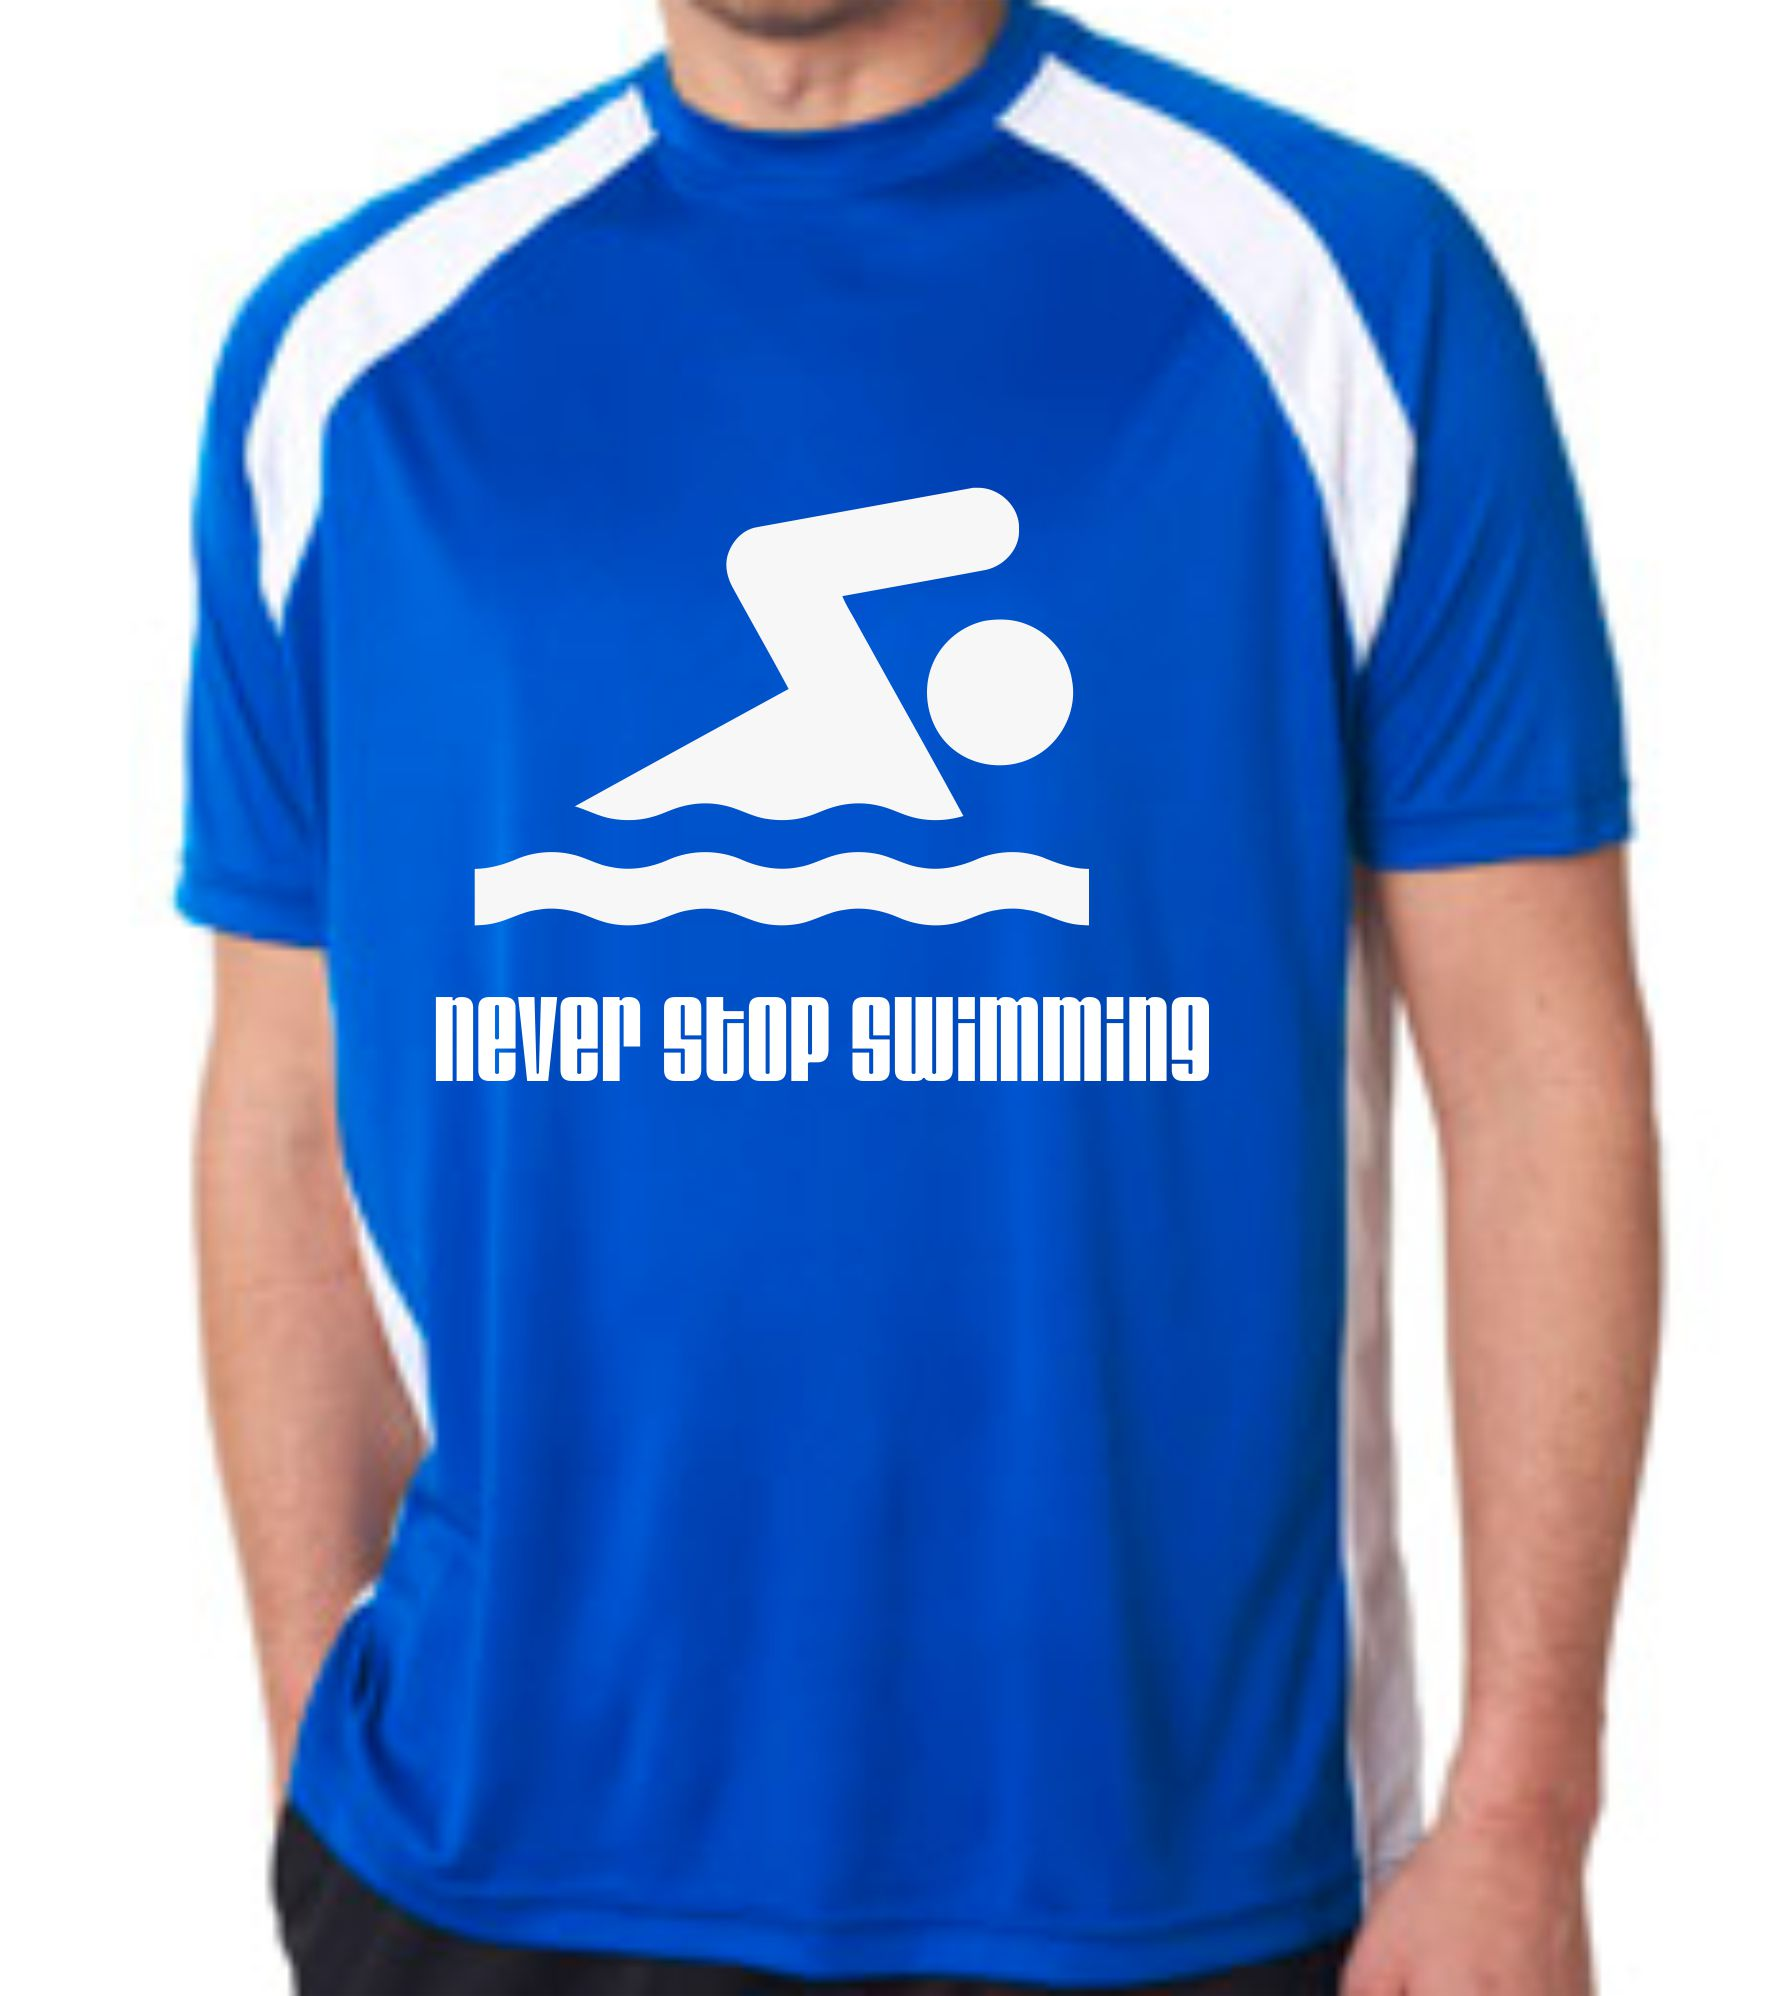 Swim shirt custom orders at ambro manufacturing for Wearing t shirt in swimming pool